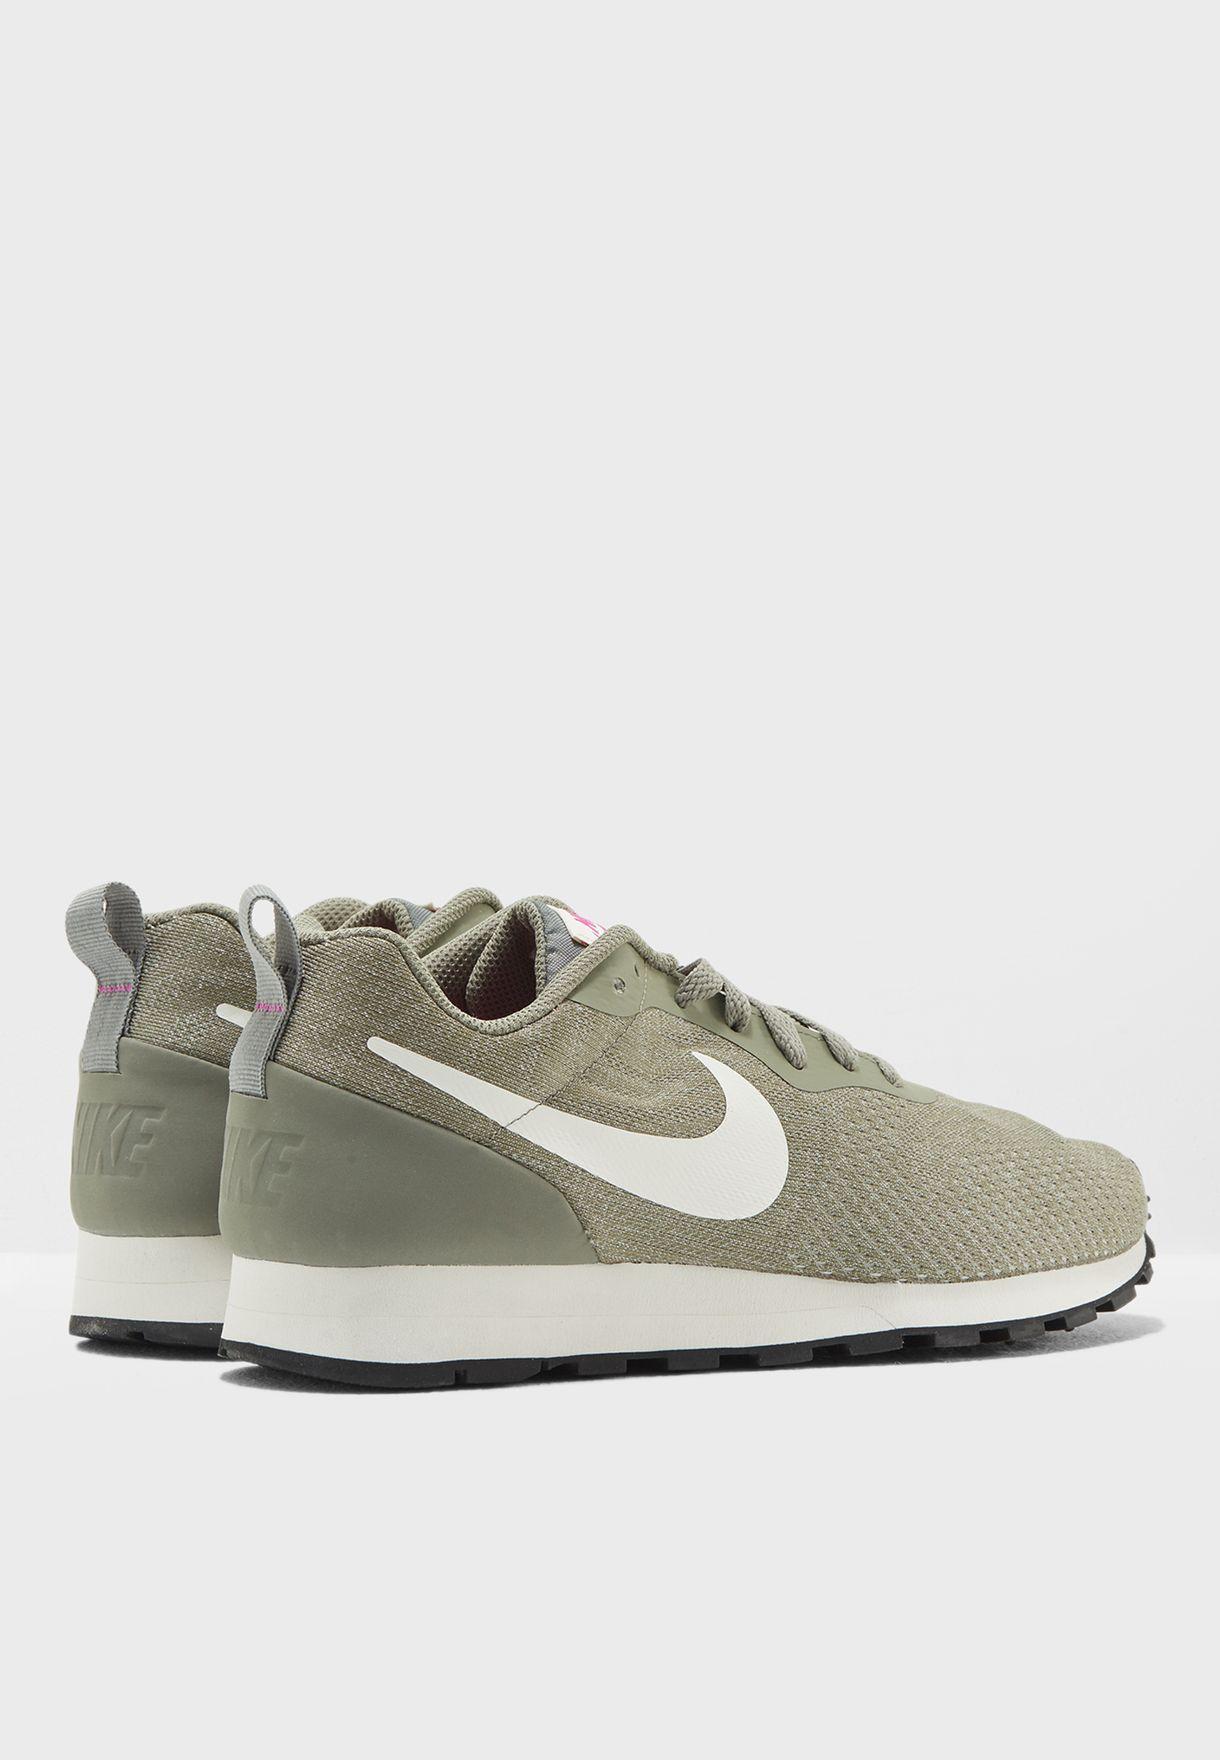 7a91fa7e2 Shop Nike green MD Runner 2 ENG Mesh 916797-002 for Women in ...